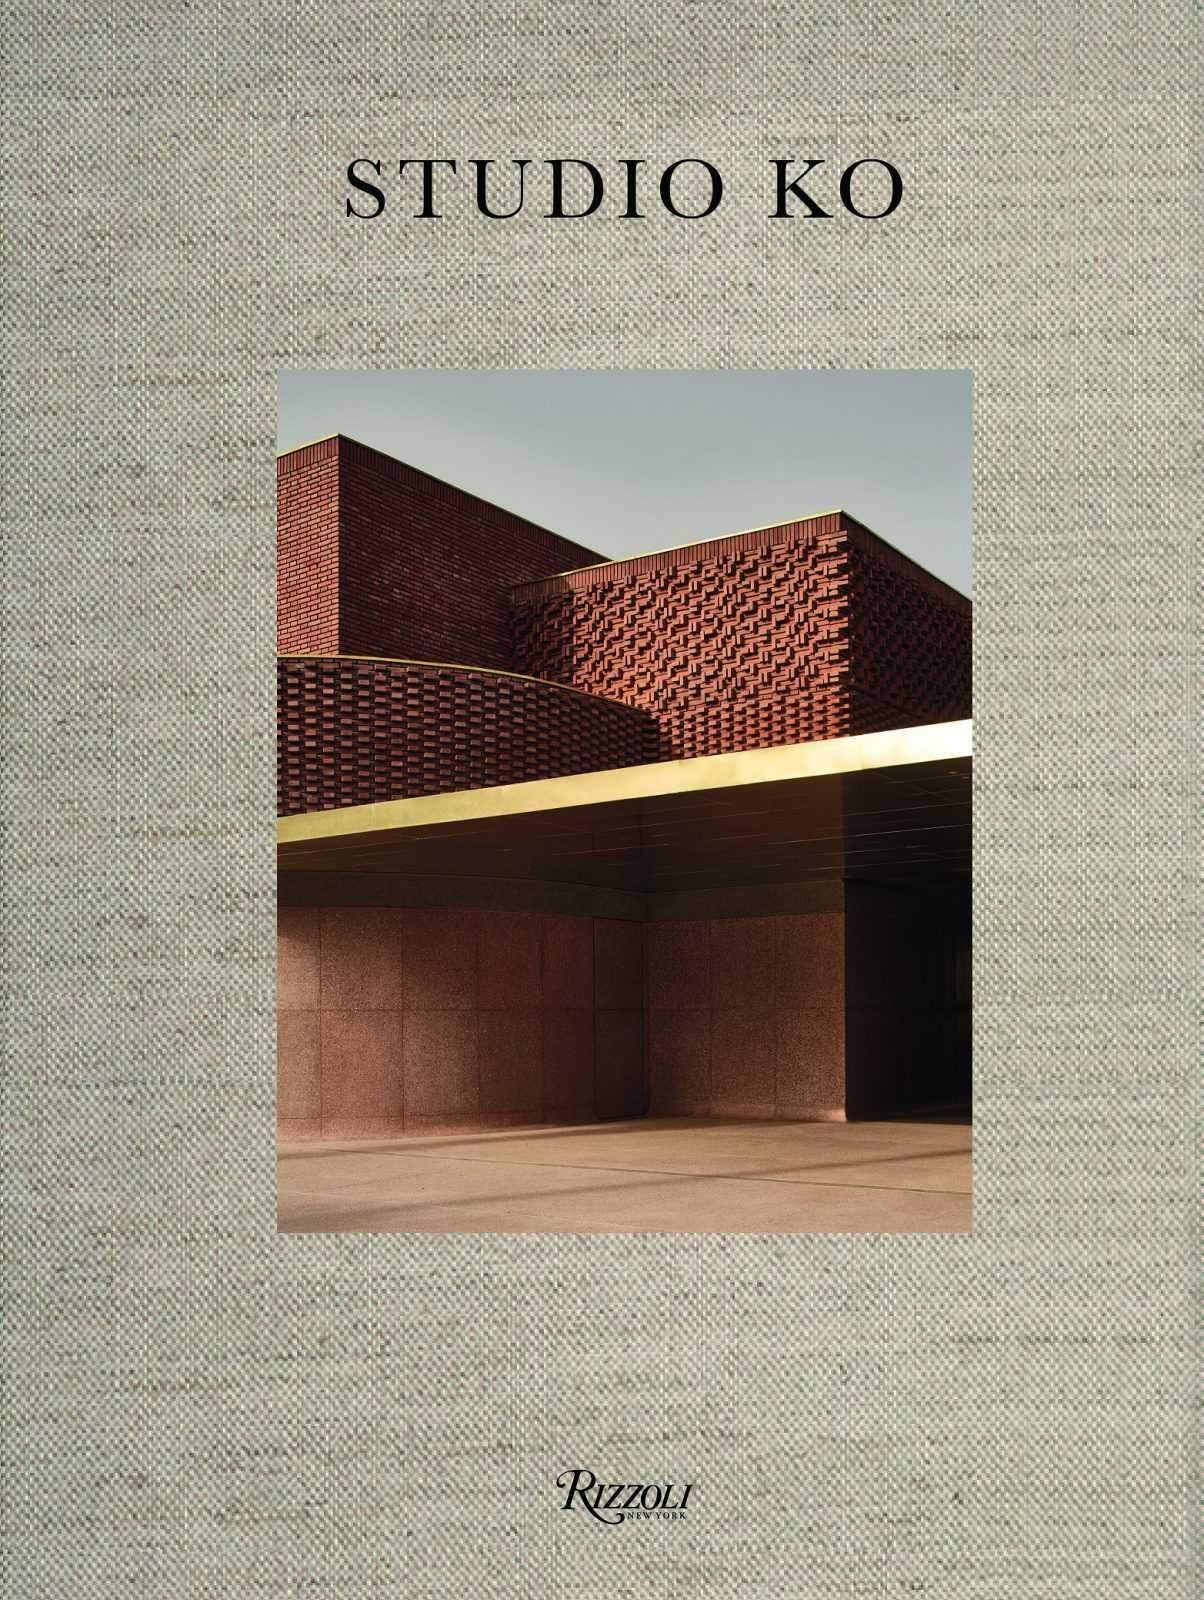 Le premier livre du Studio KO